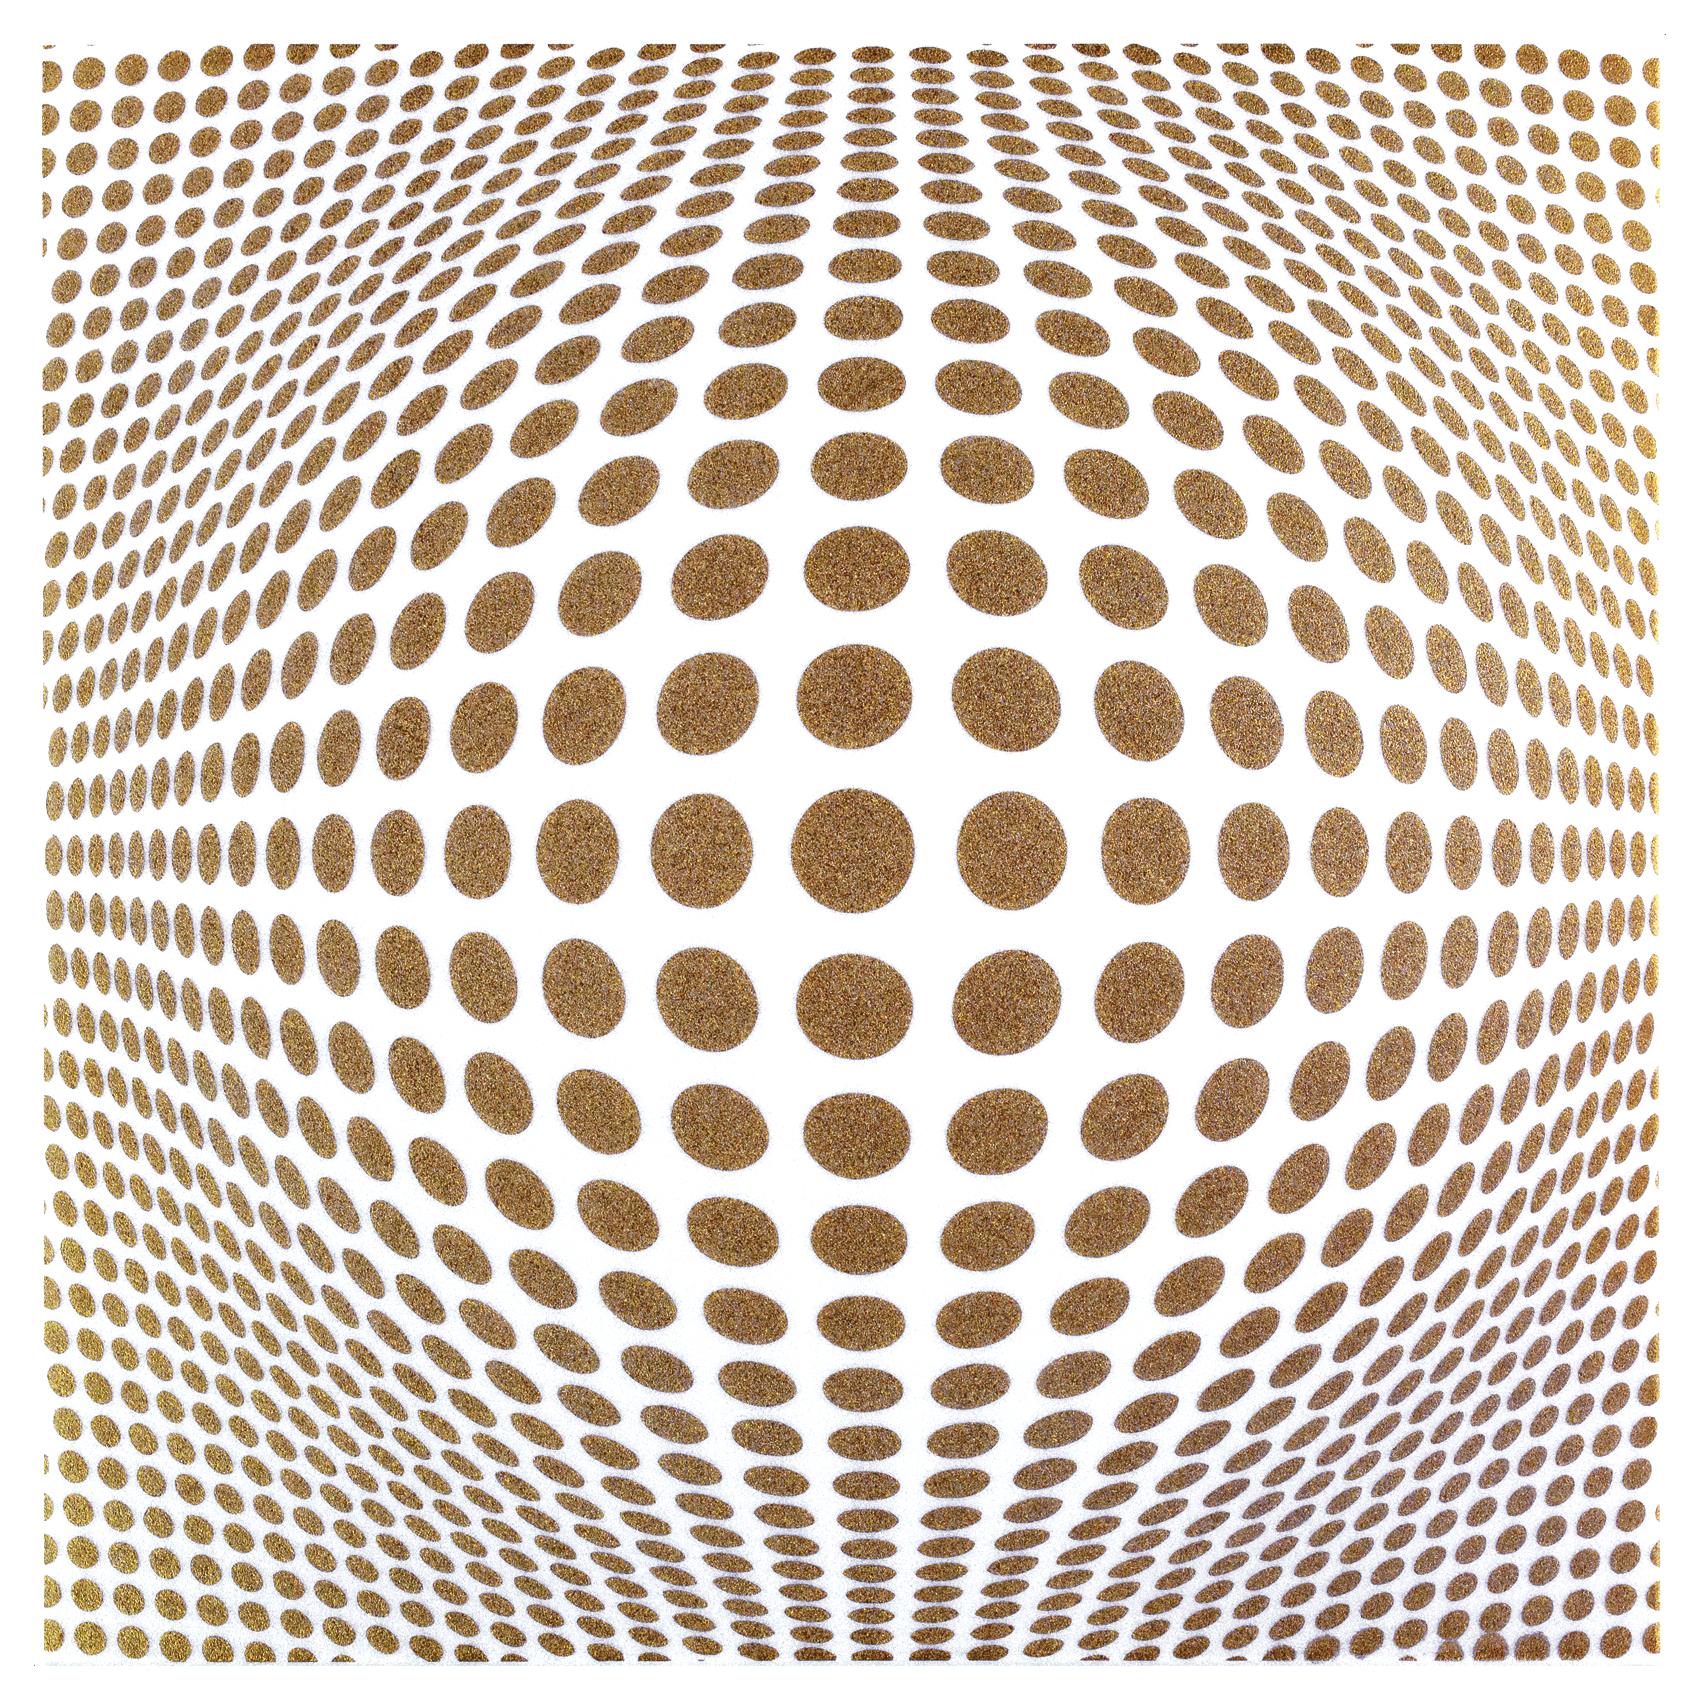 40 qm Deckenplatten Panorama-Effekt Polystyrolplatten 50x50cm DISCO BLACK